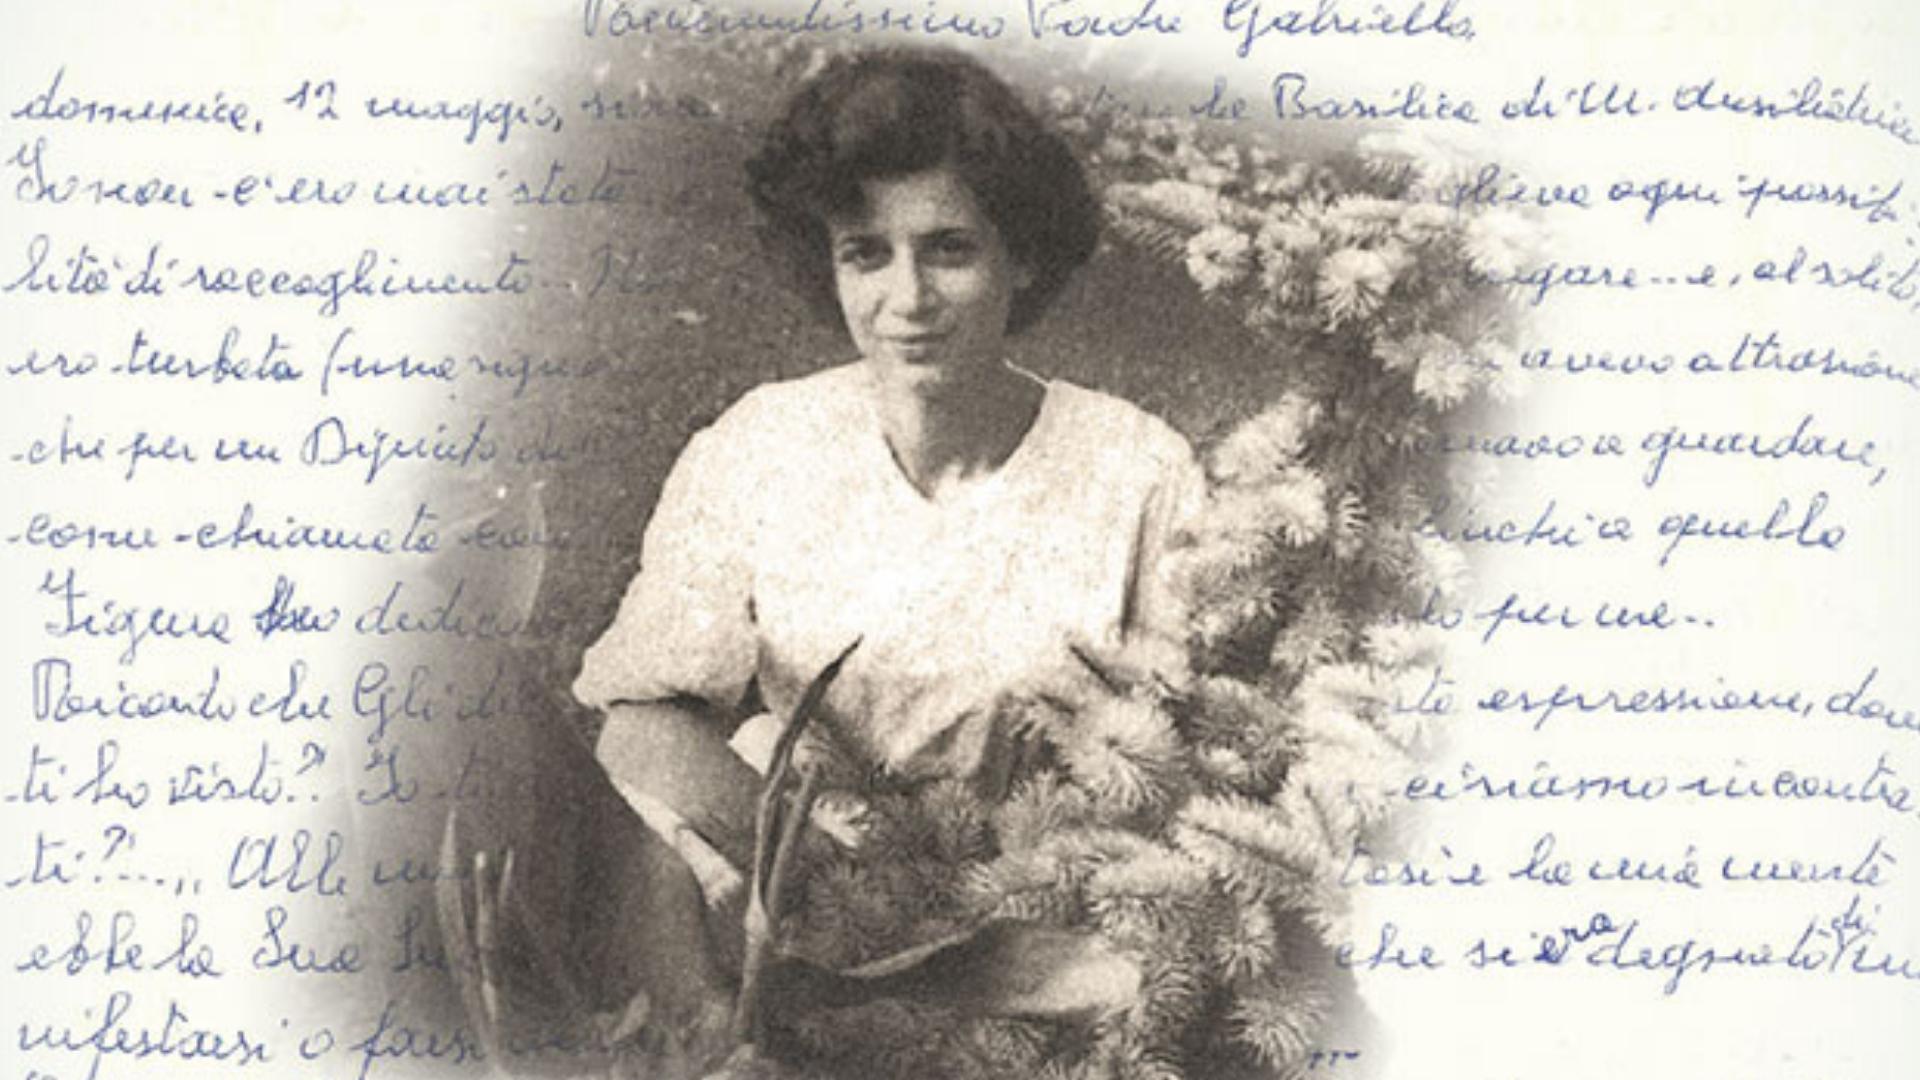 Vera Grita, archives donboscoitalia.it